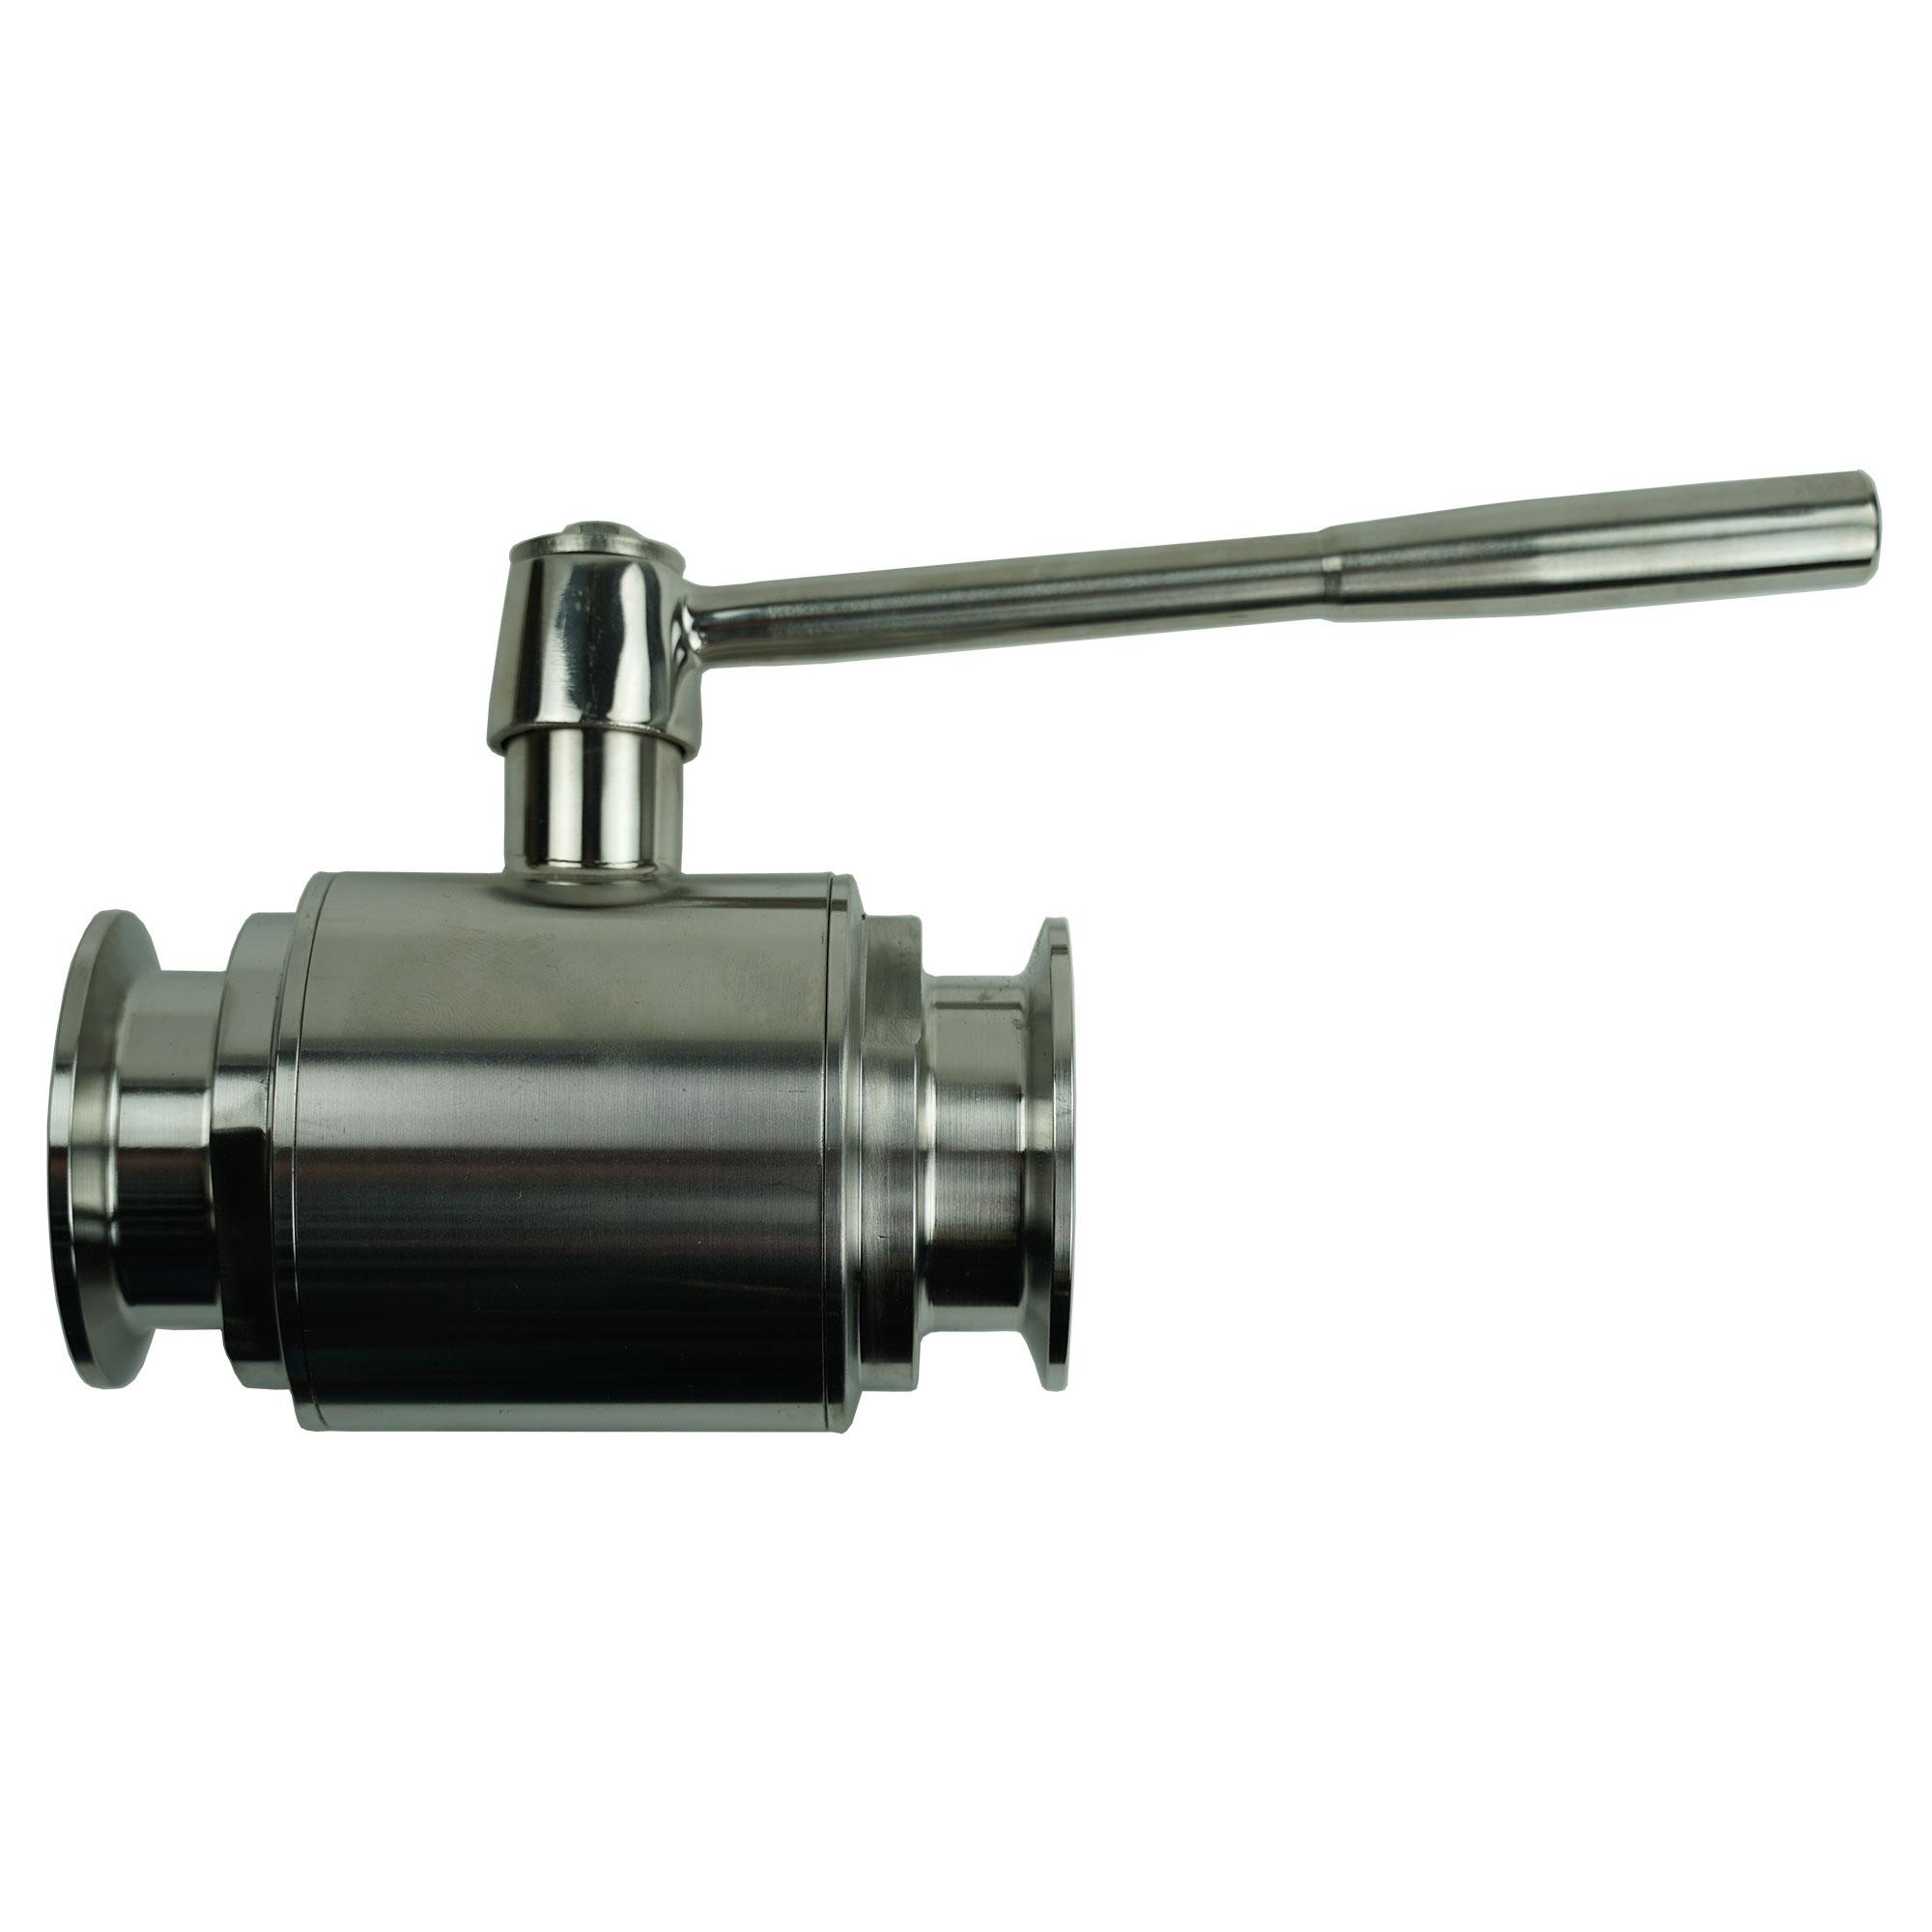 2 inch tri-clamp drain valve